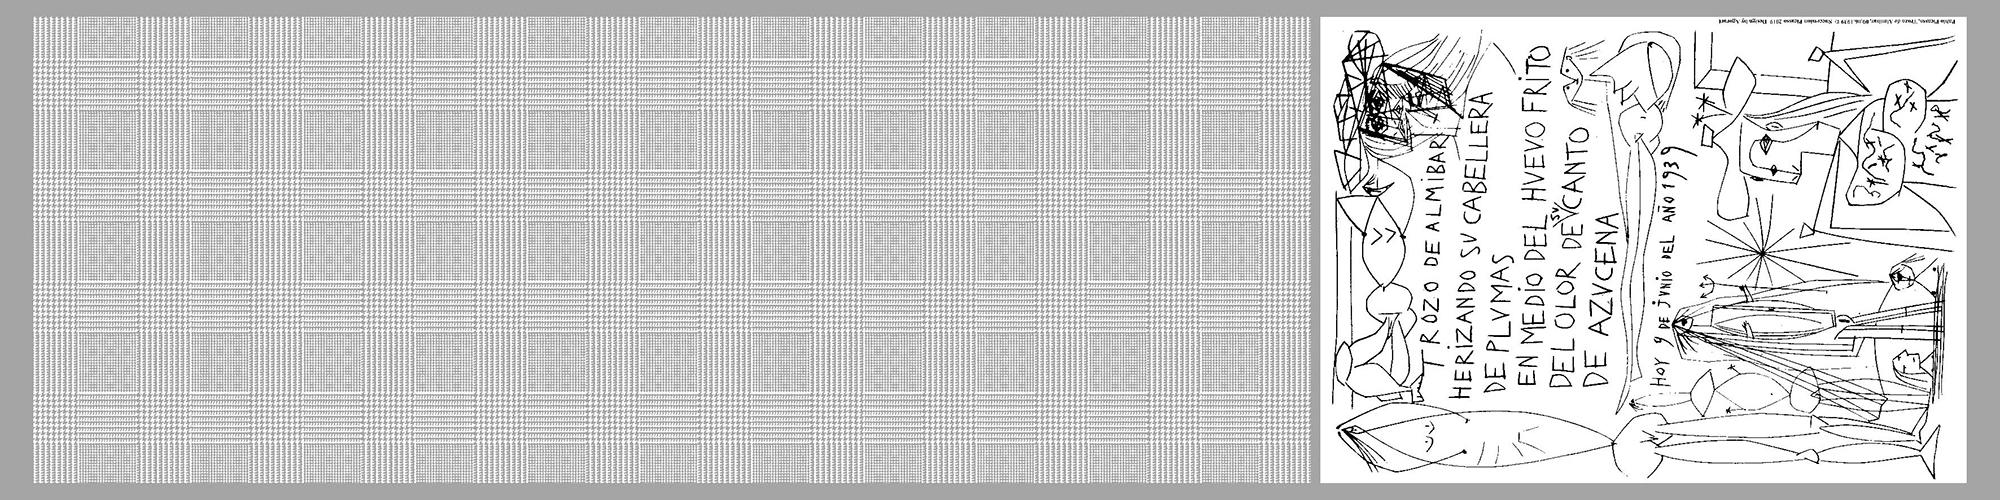 PIC 93 - layout 45x180 cm